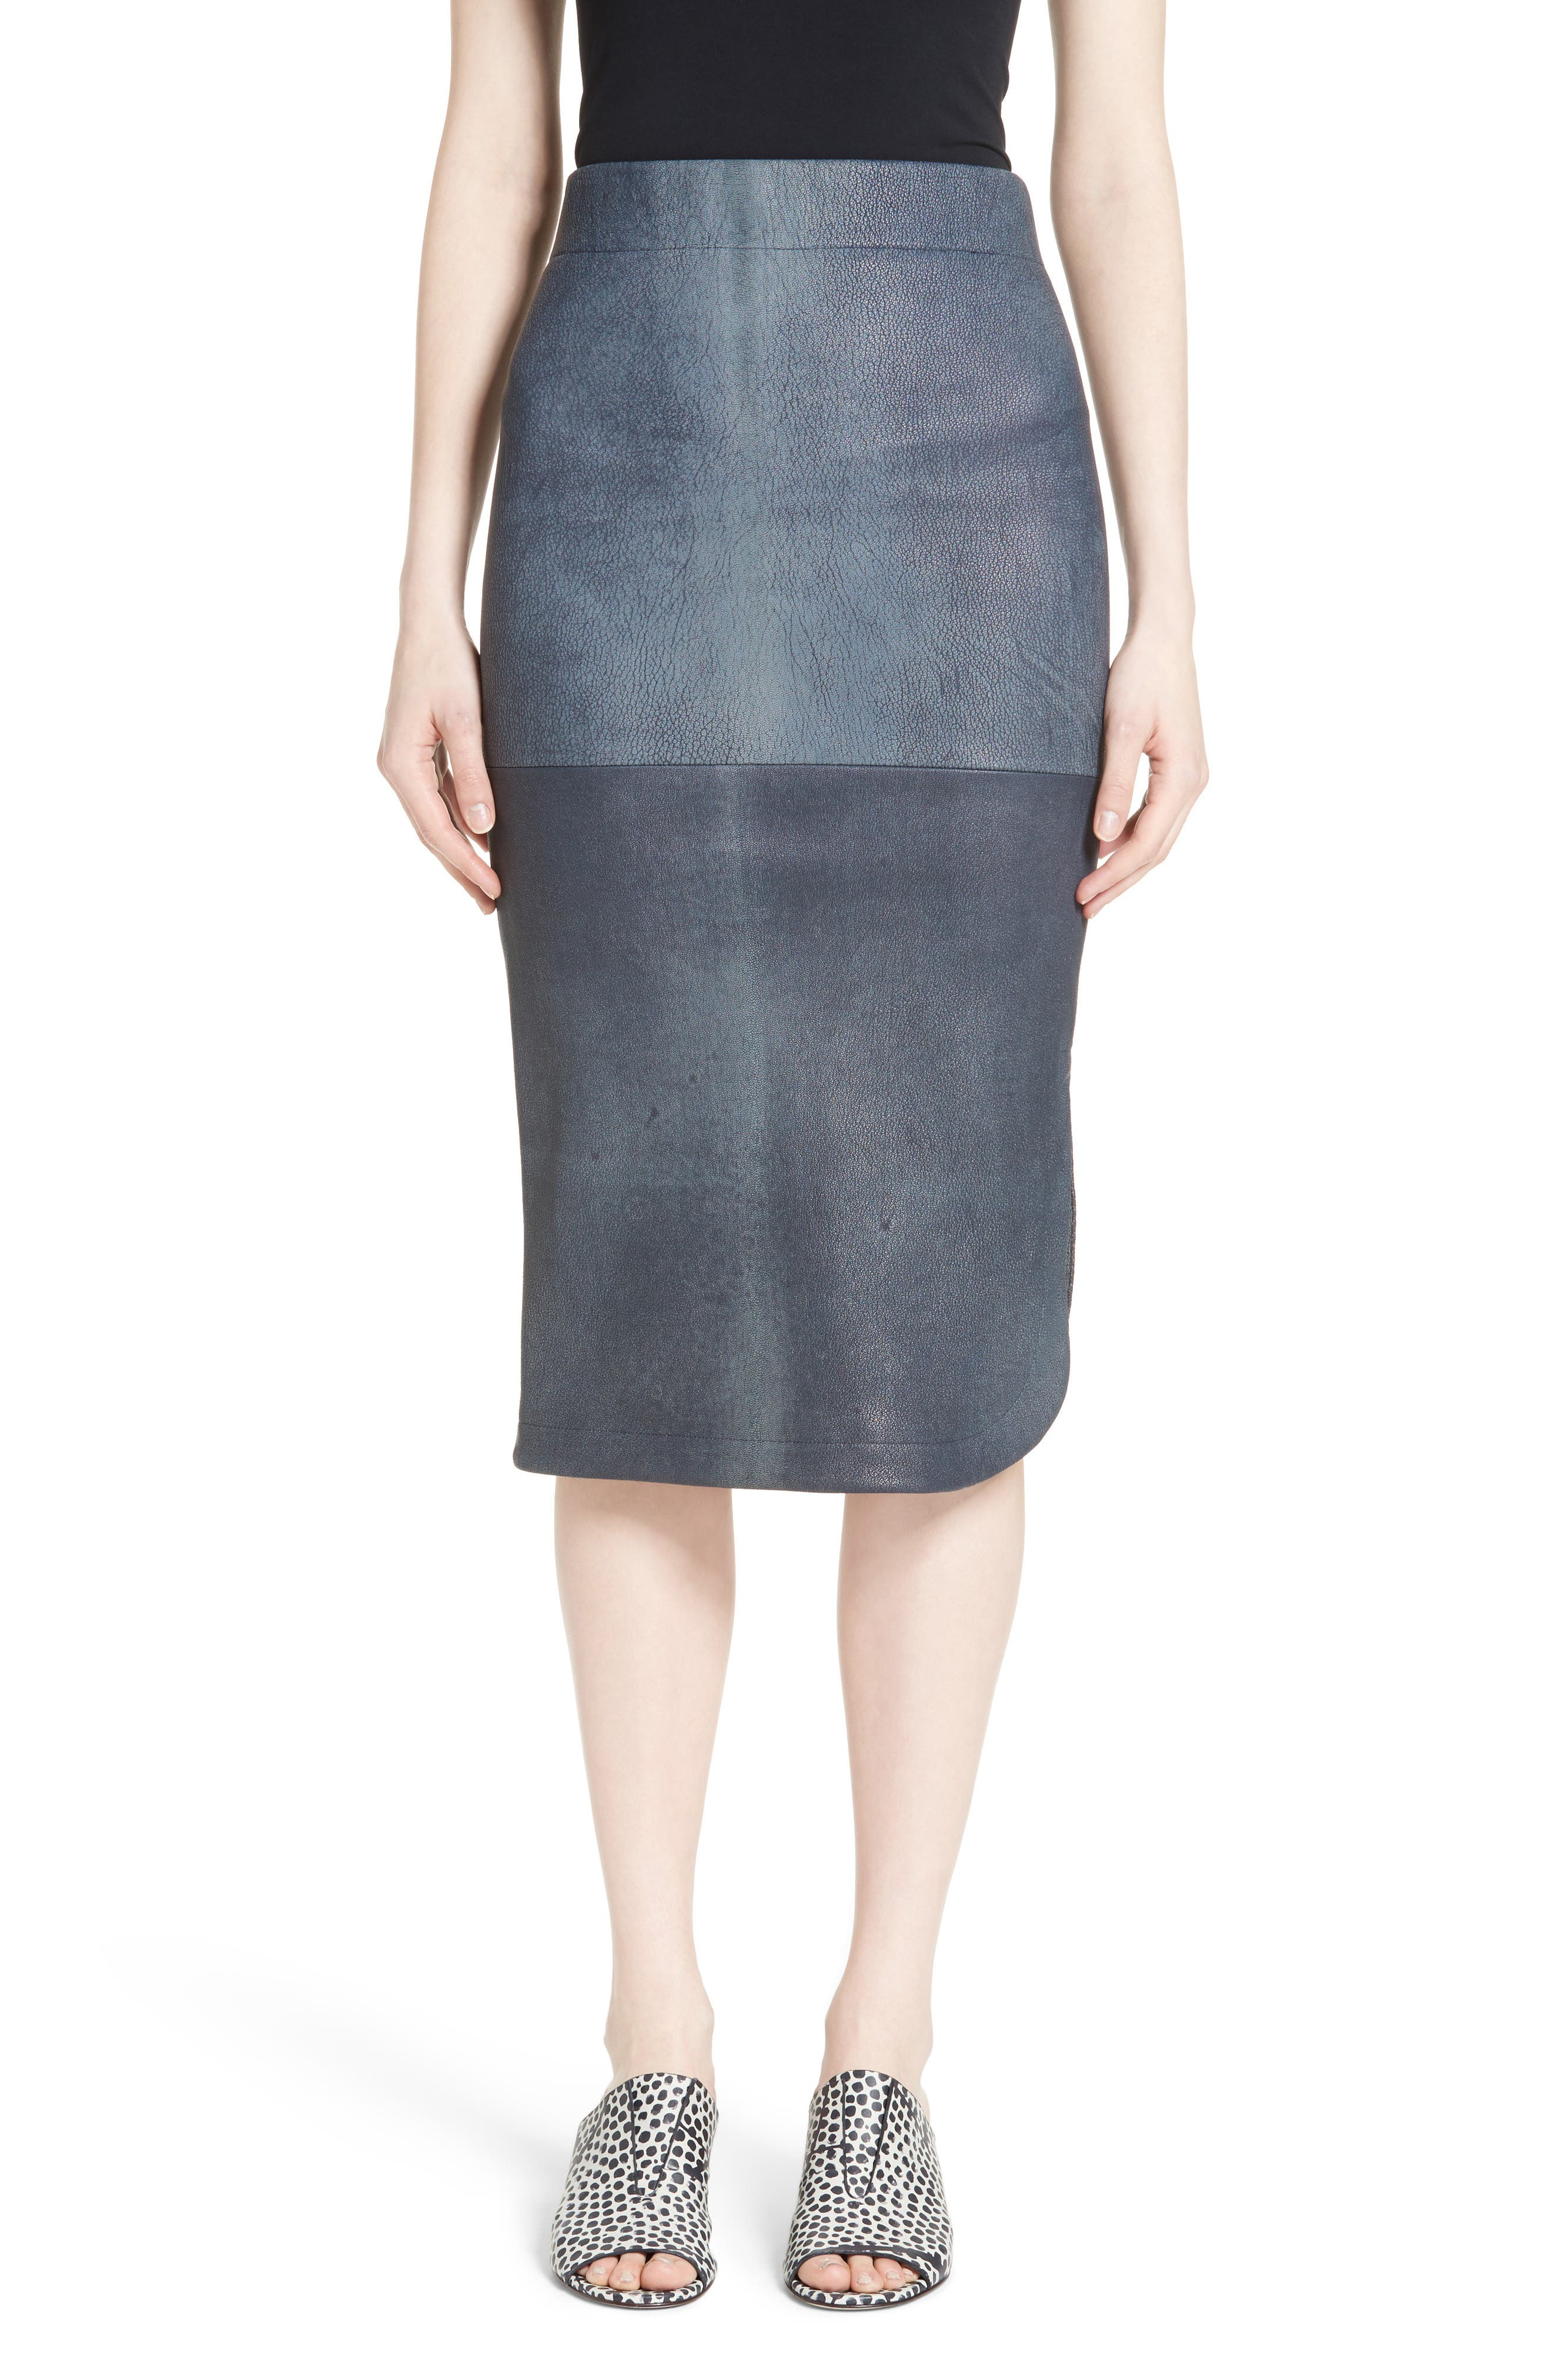 Alternate Image 1 Selected - Zero + Maria Cornejo Rai Leather Curved Skirt